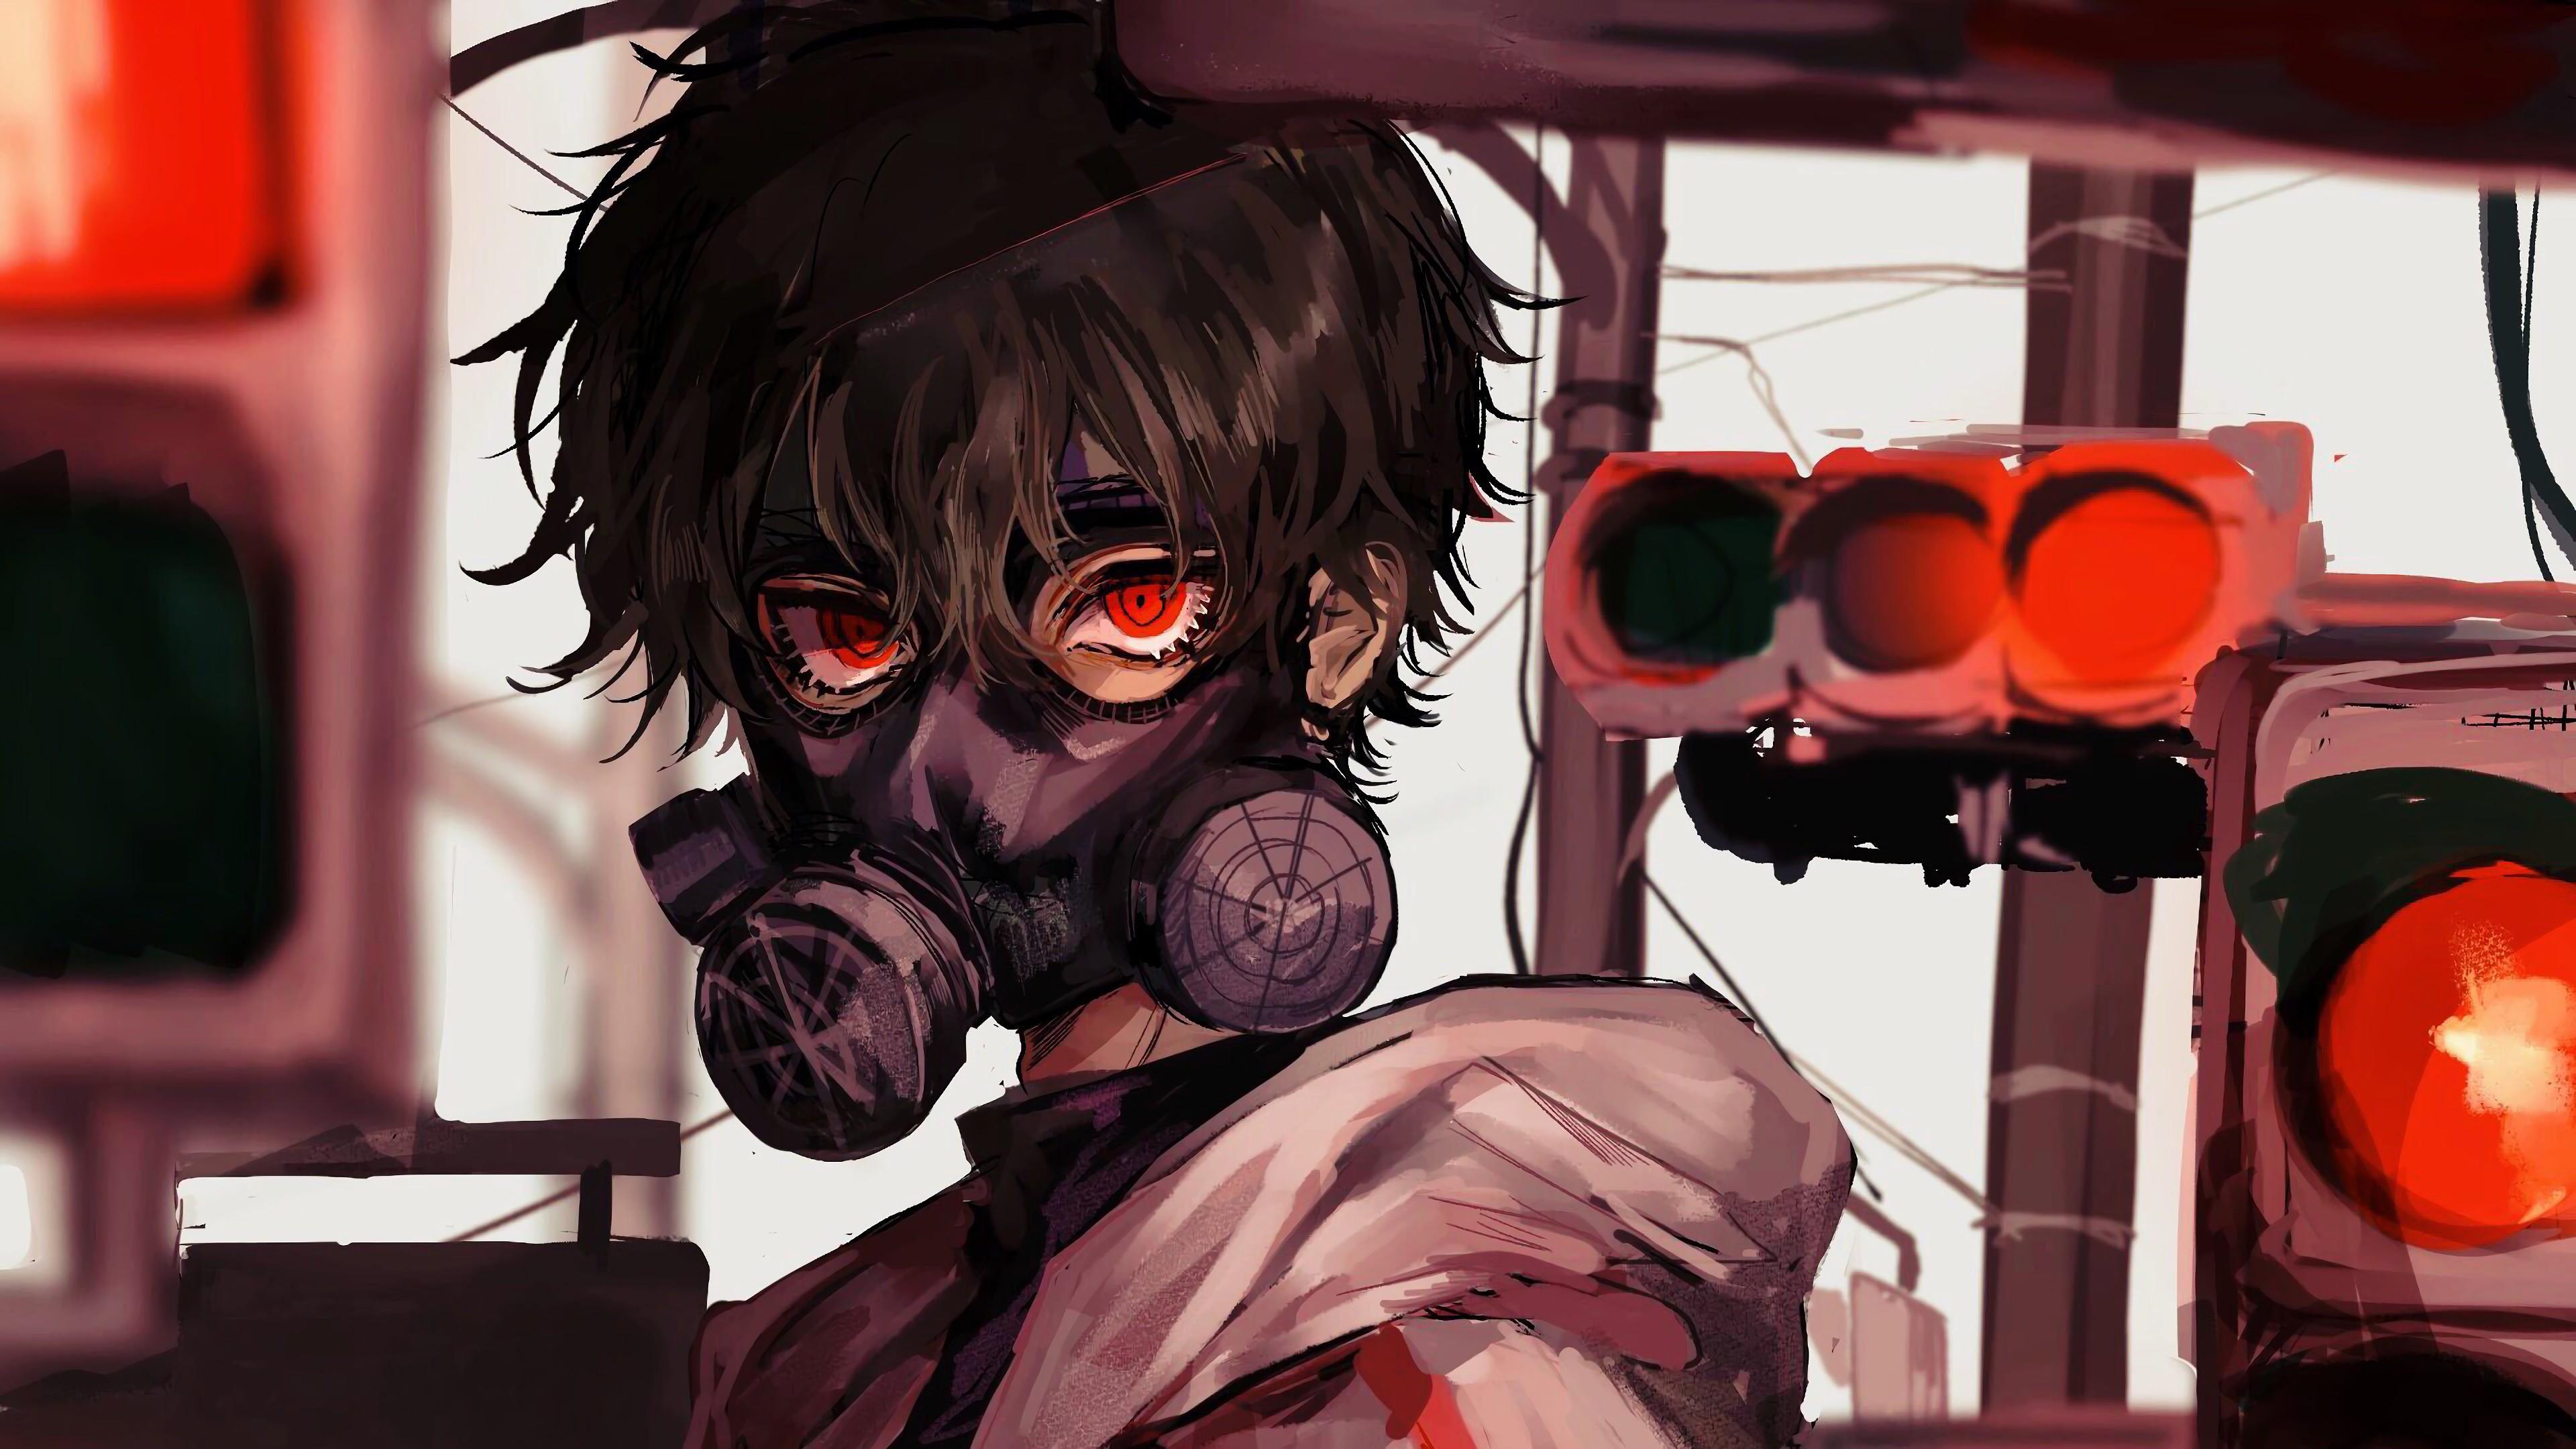 Mask Badass Anime Boy Wallpapers - Wallpaper Cave